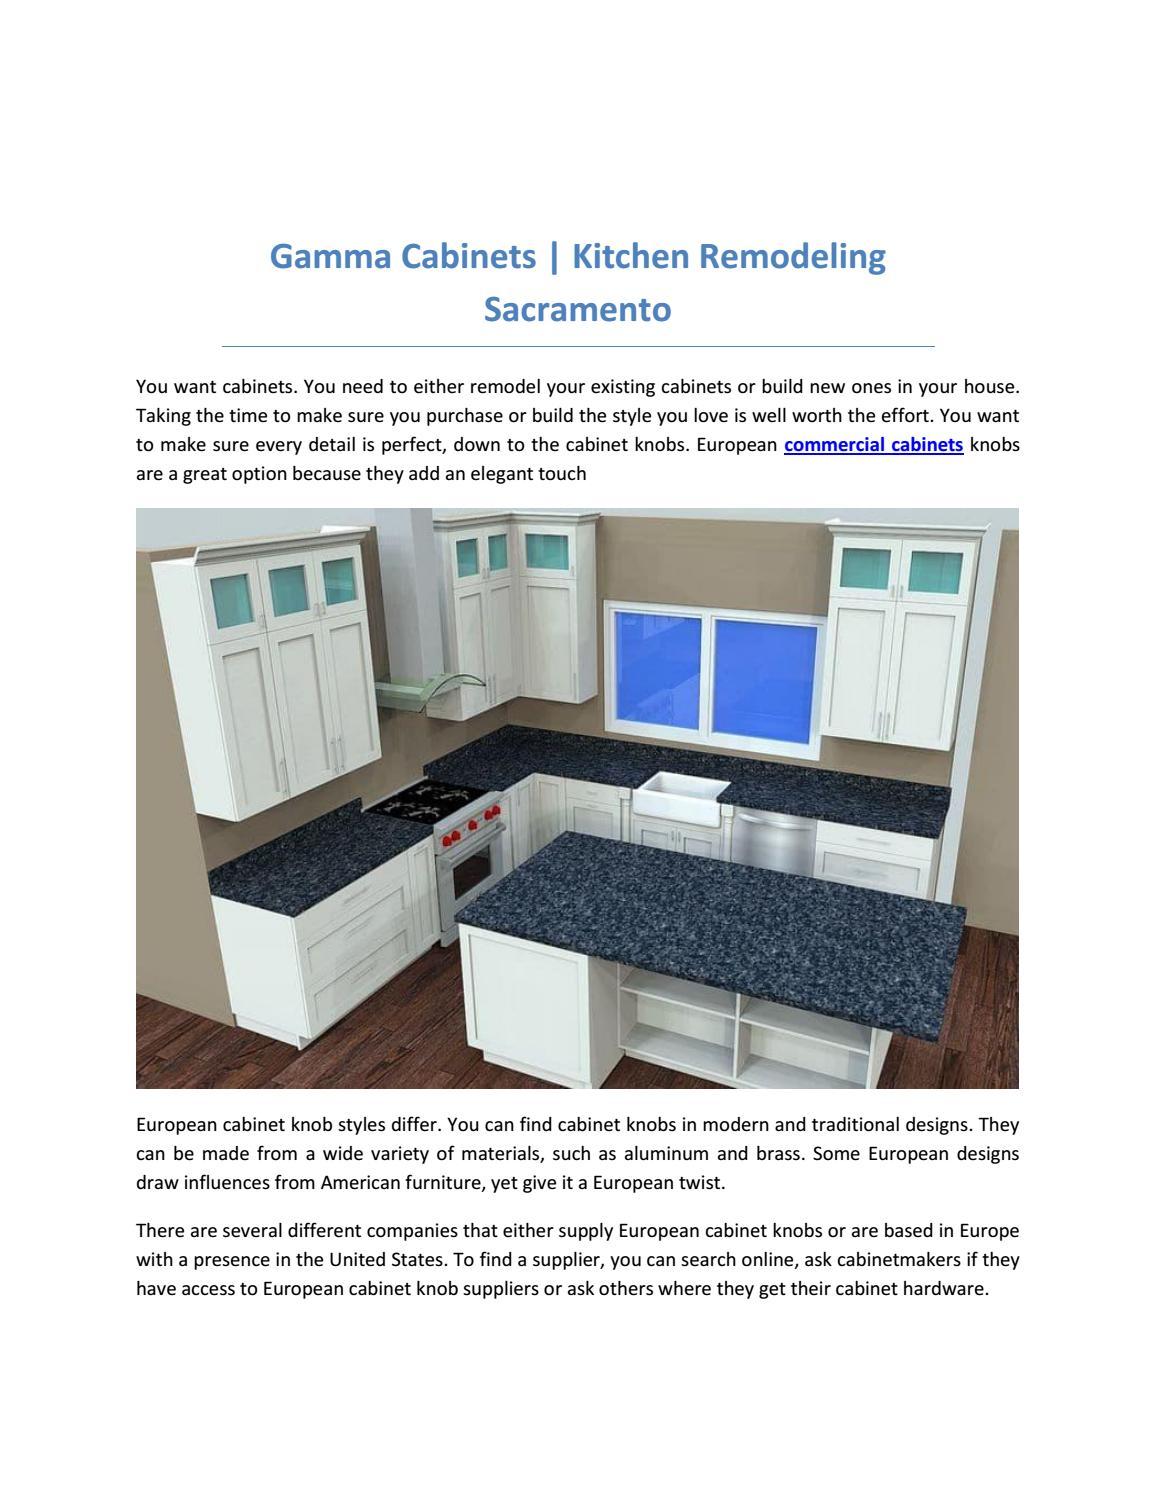 Gamma Cabinets Kitchen Remodeling Sacramento By Gammacabinetsusa